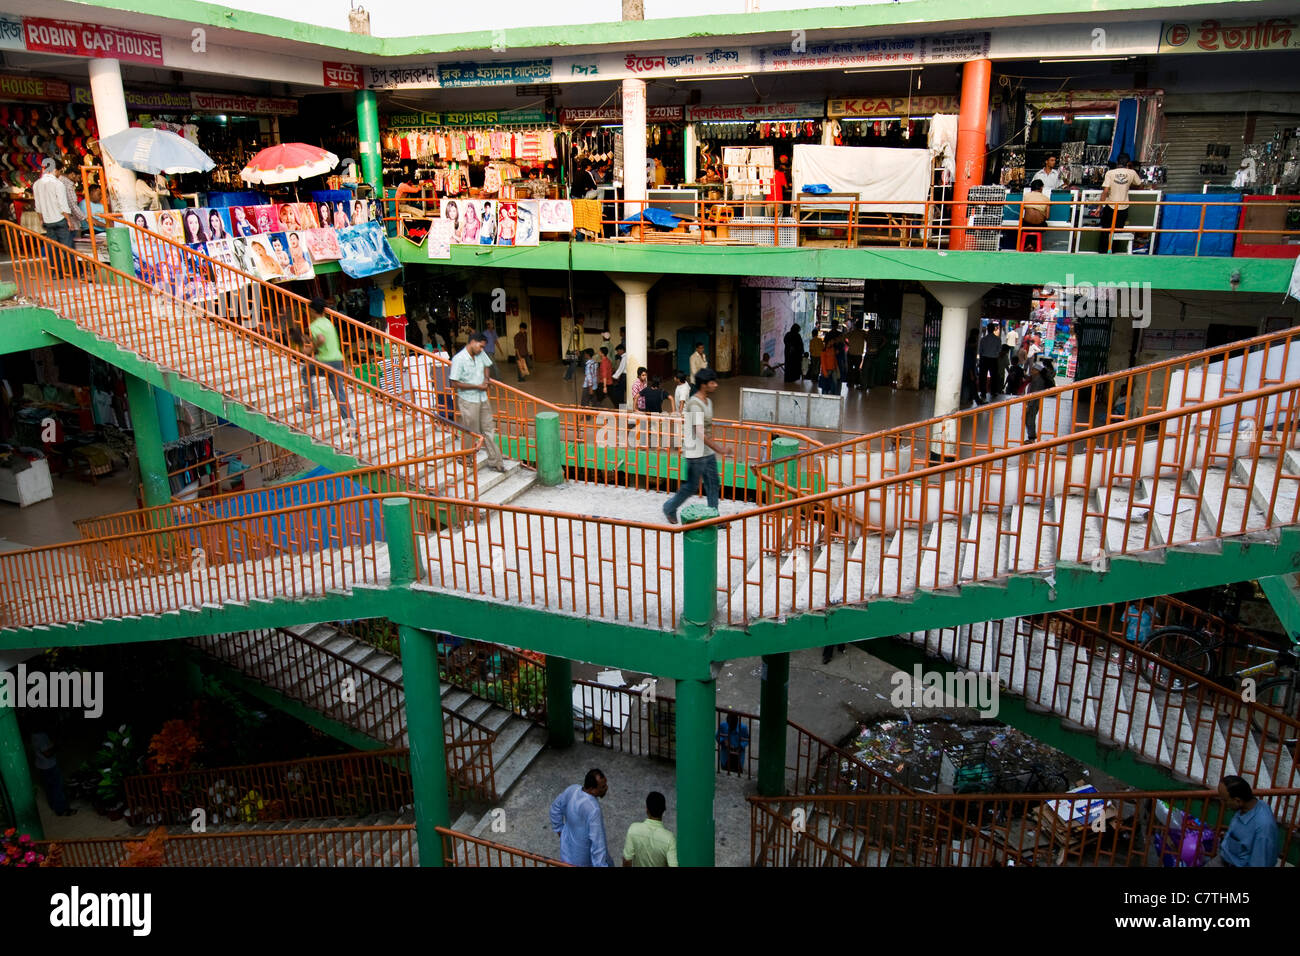 Bangladesh, Dhaka, the market - Stock Image